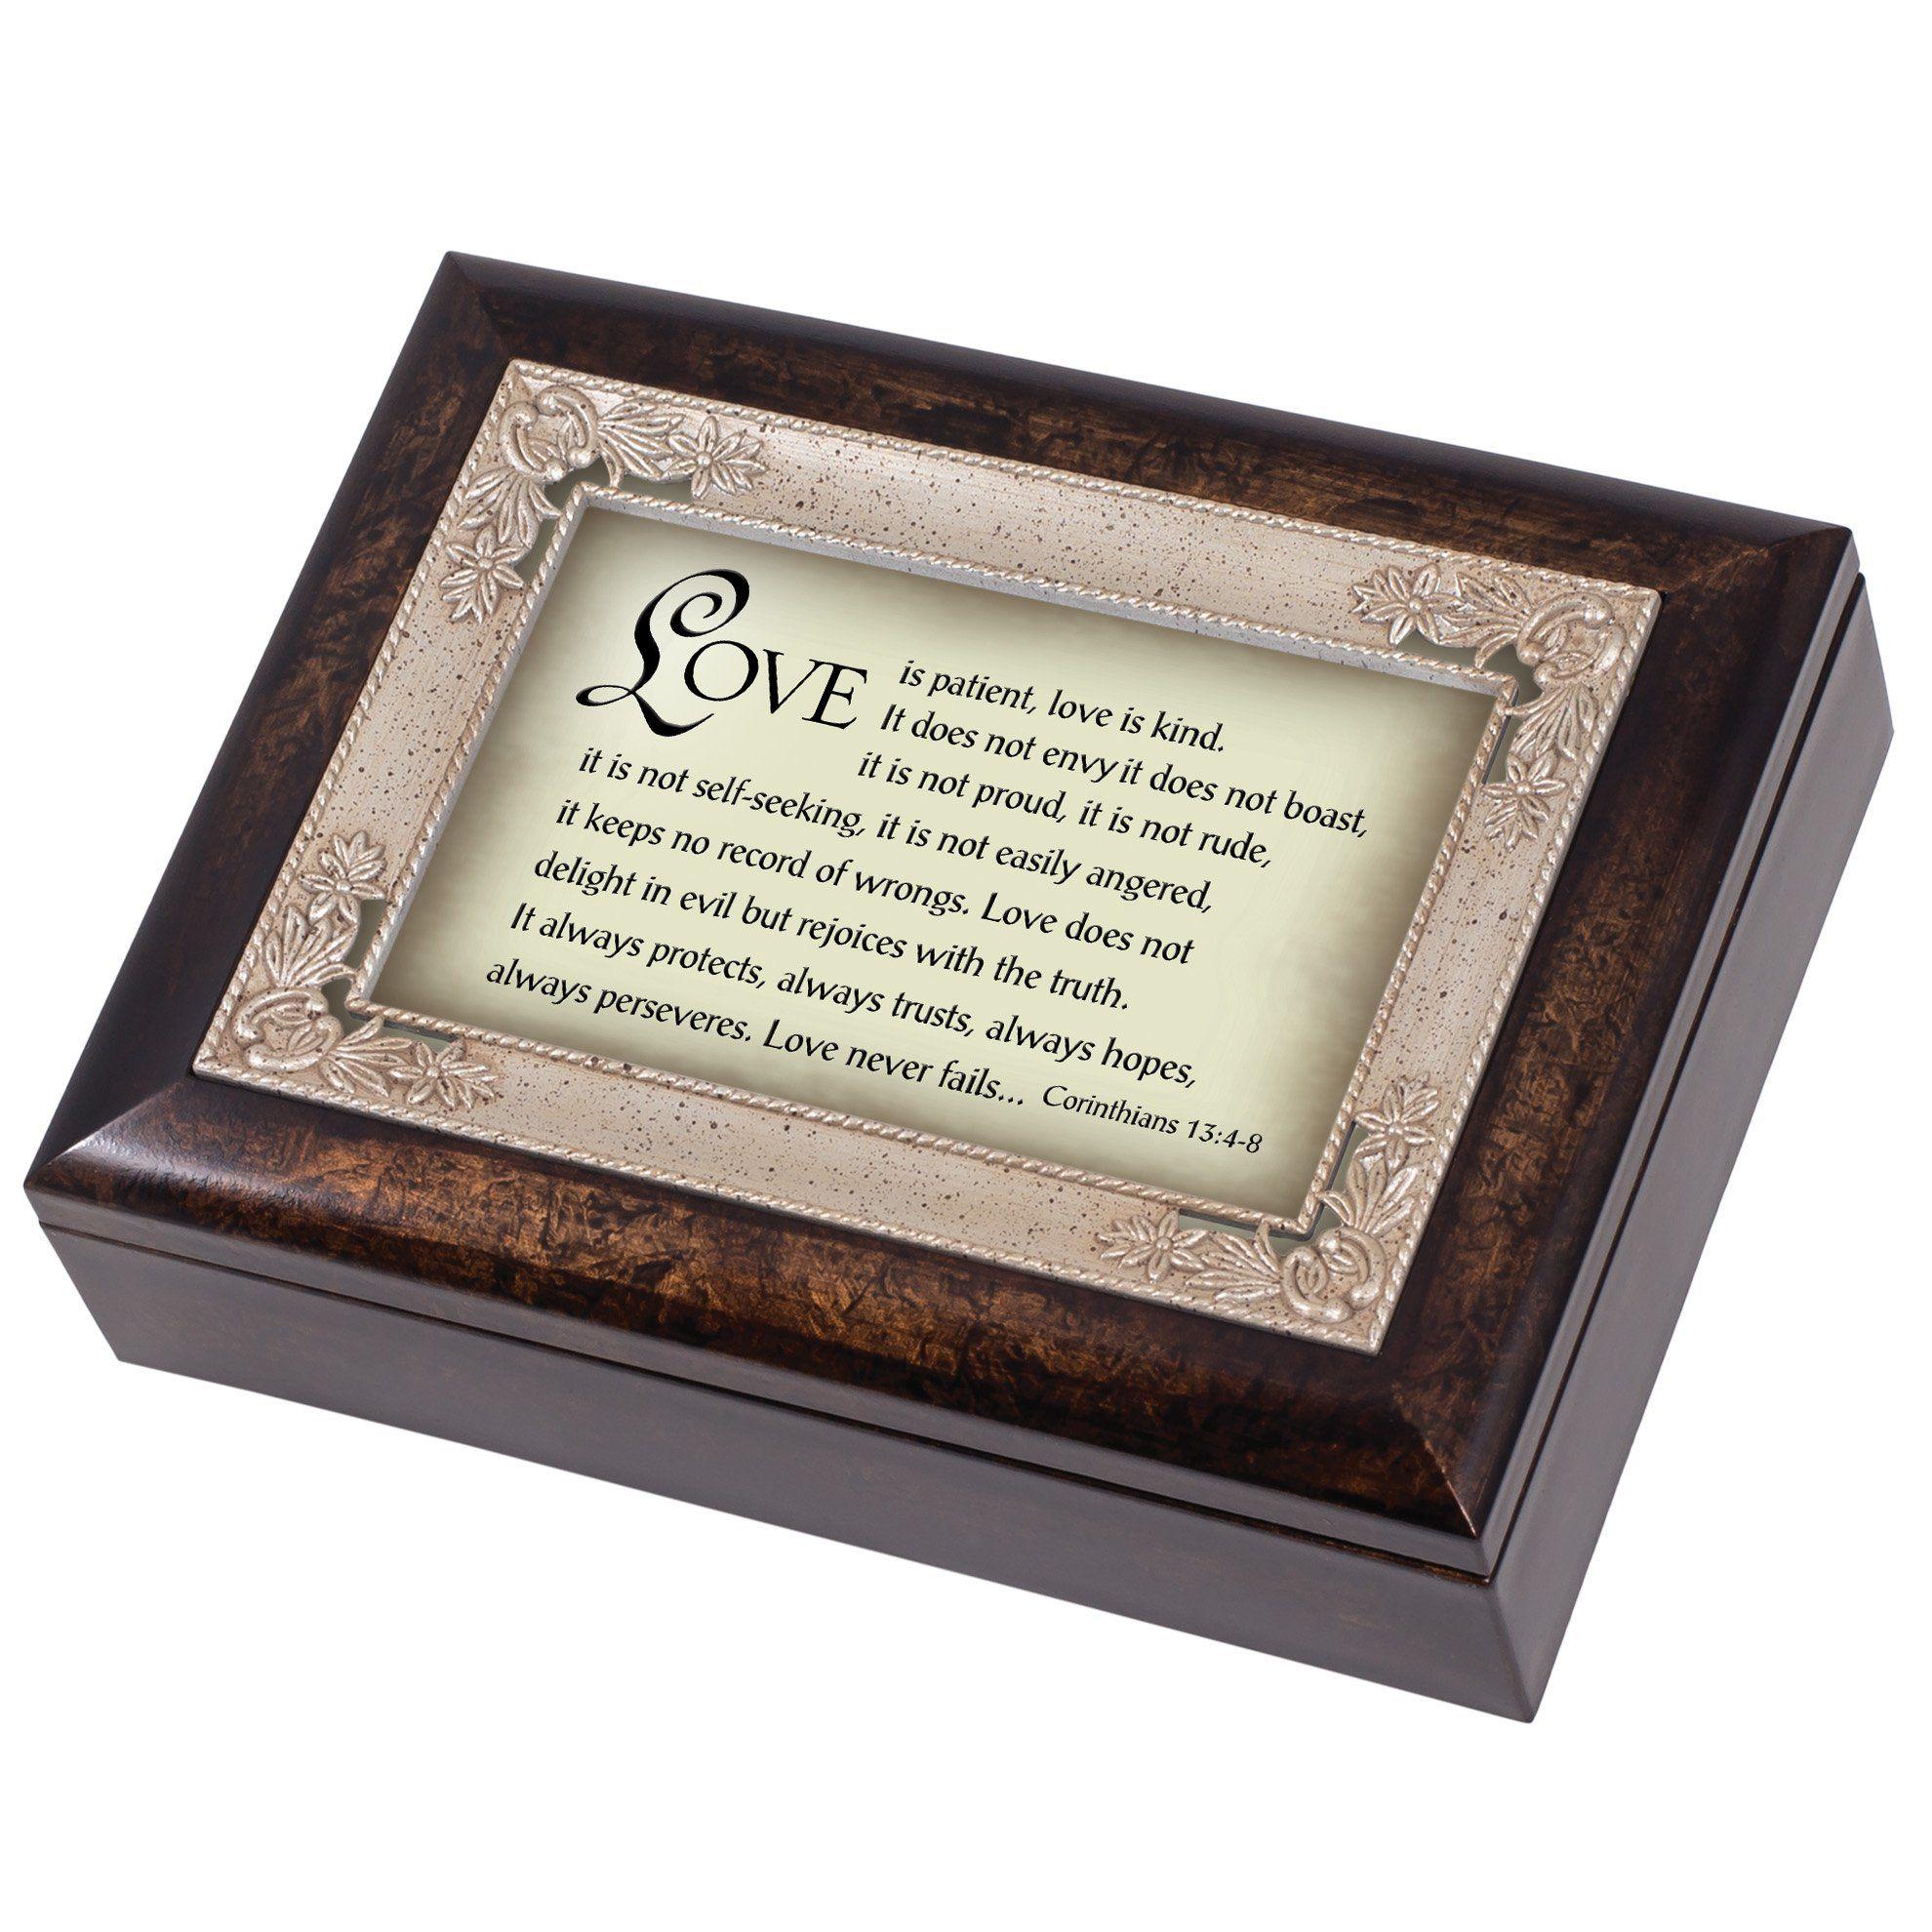 Love is Patient 1 Corinthians 13 Dark Wood Finish Jewelry Music Box Plays Tune Amazing Grace